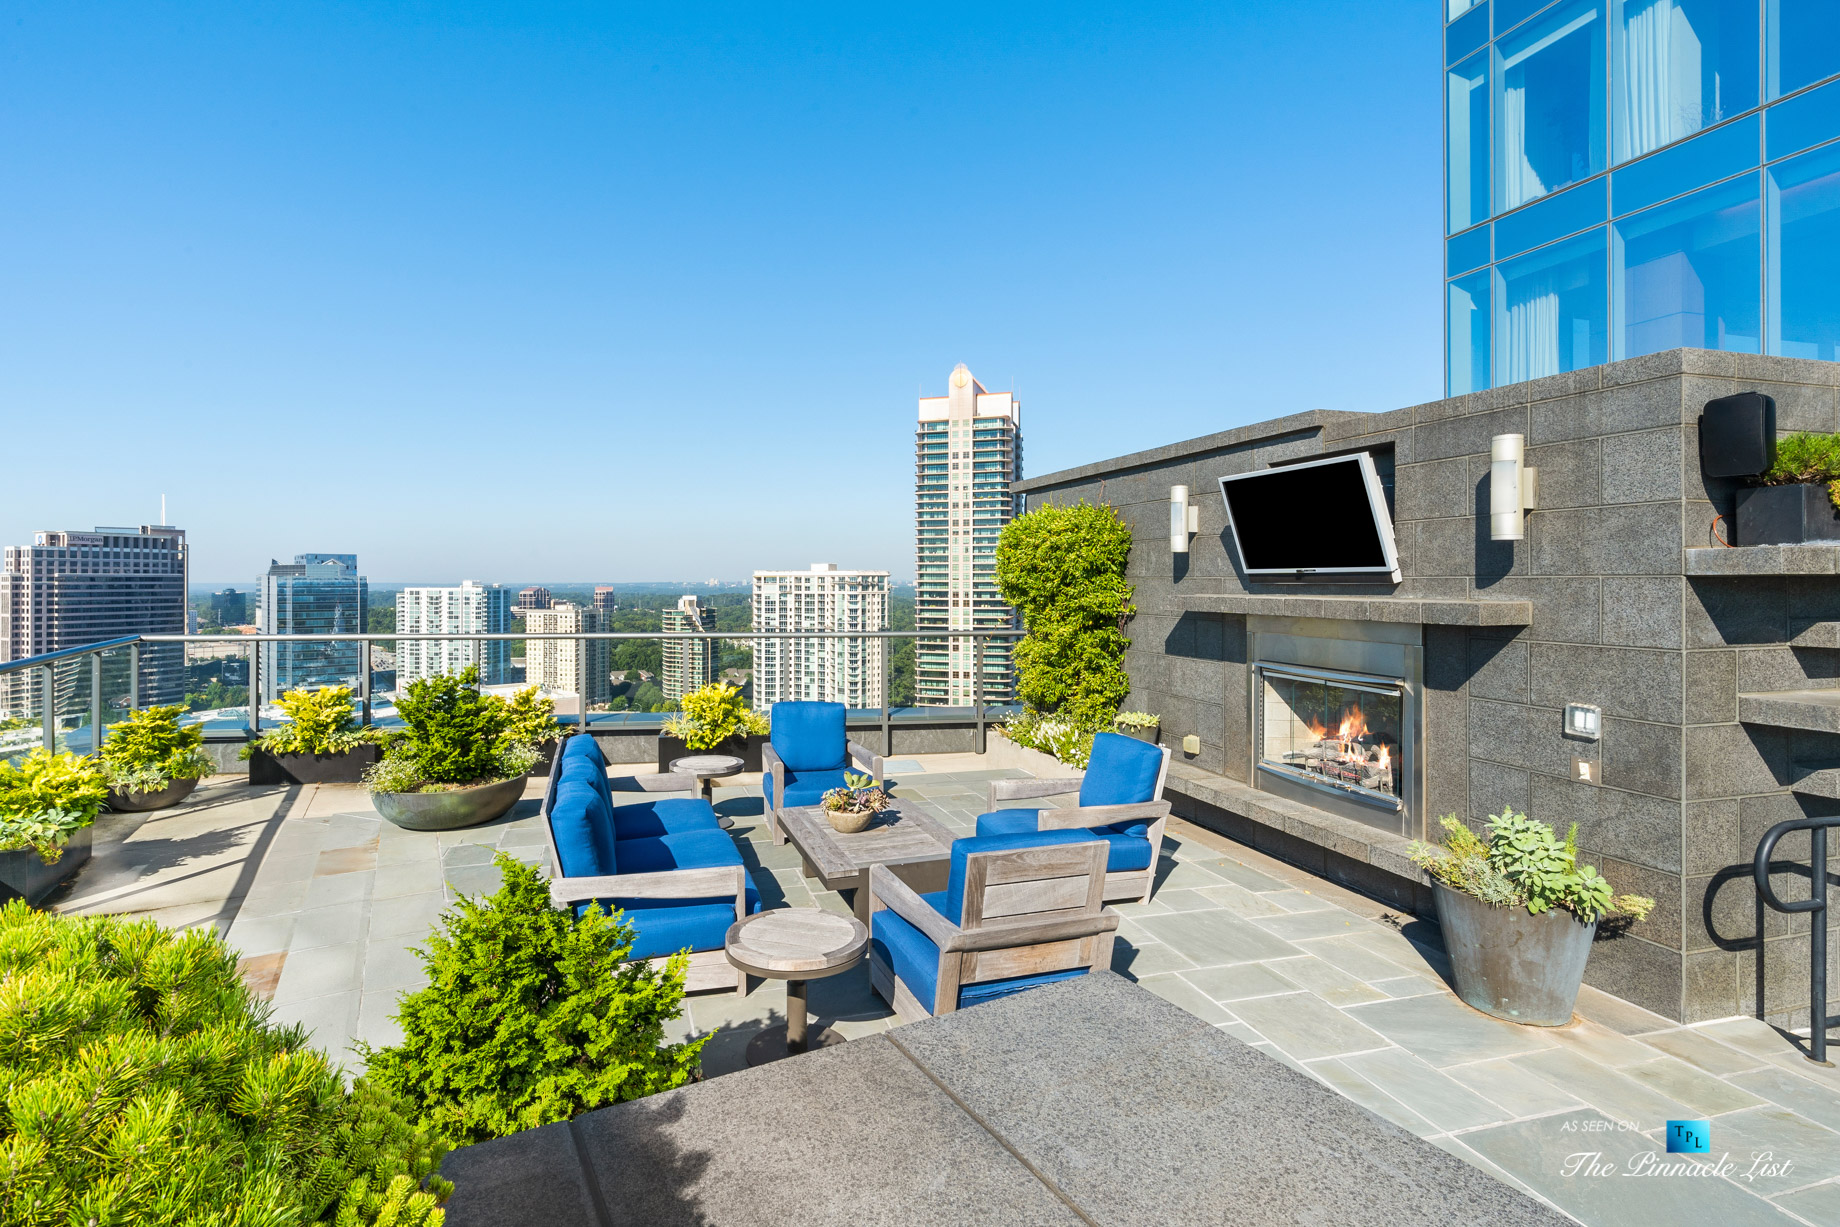 3630 Peachtree Rd NE, Unit 2307, Atlanta, GA, USA – Apartment Exterior Private Deck with Fireplace – Luxury Real Estate – Ritz-Carlton Residences Buckhead